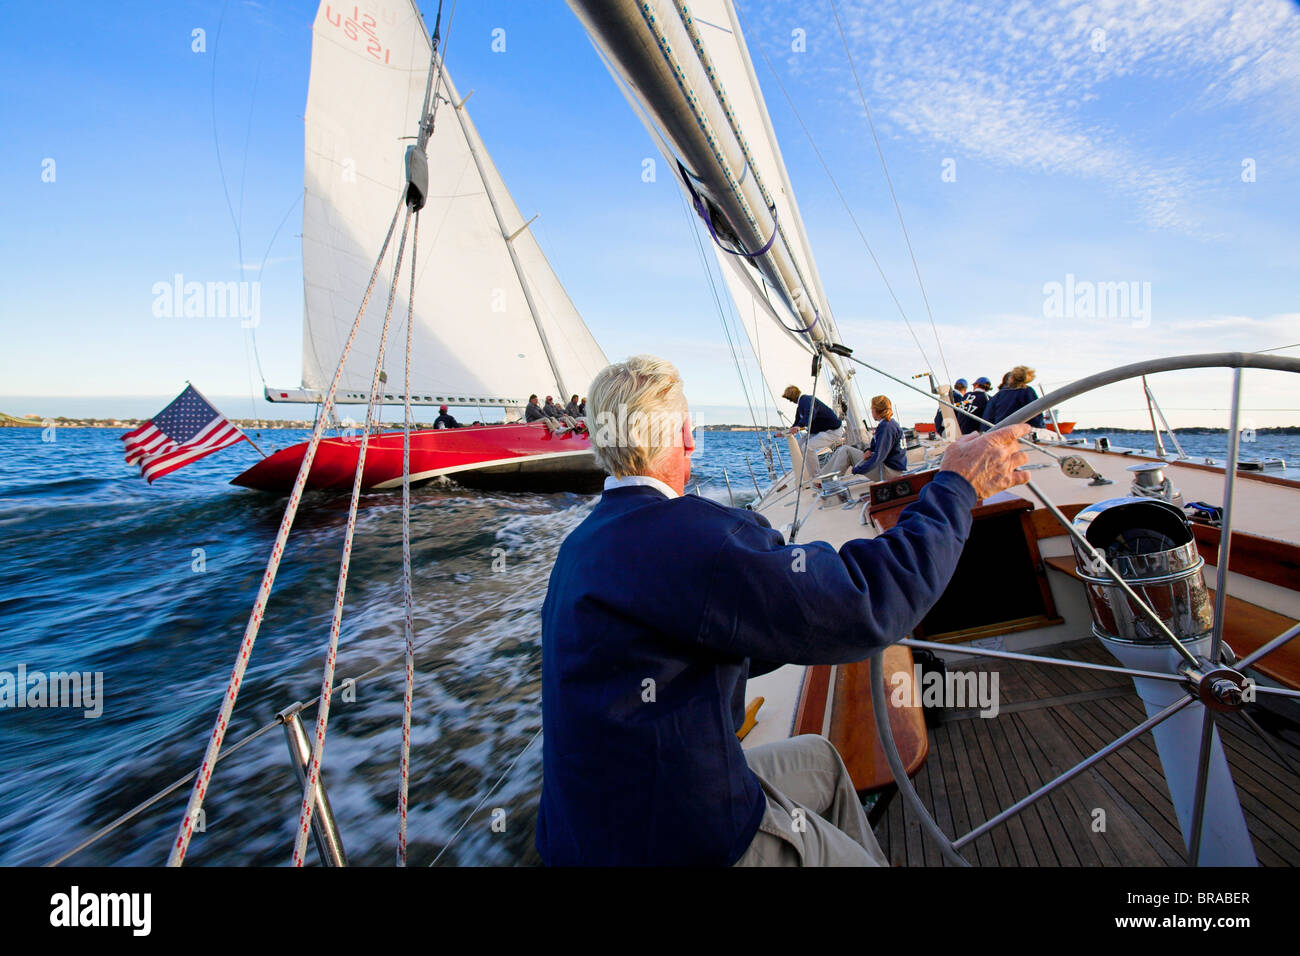 Racing onboard 12m Weatherly with American Eagle to leeward in Narragansett Bay, Newport, Rhode Island, USA. - Stock Image